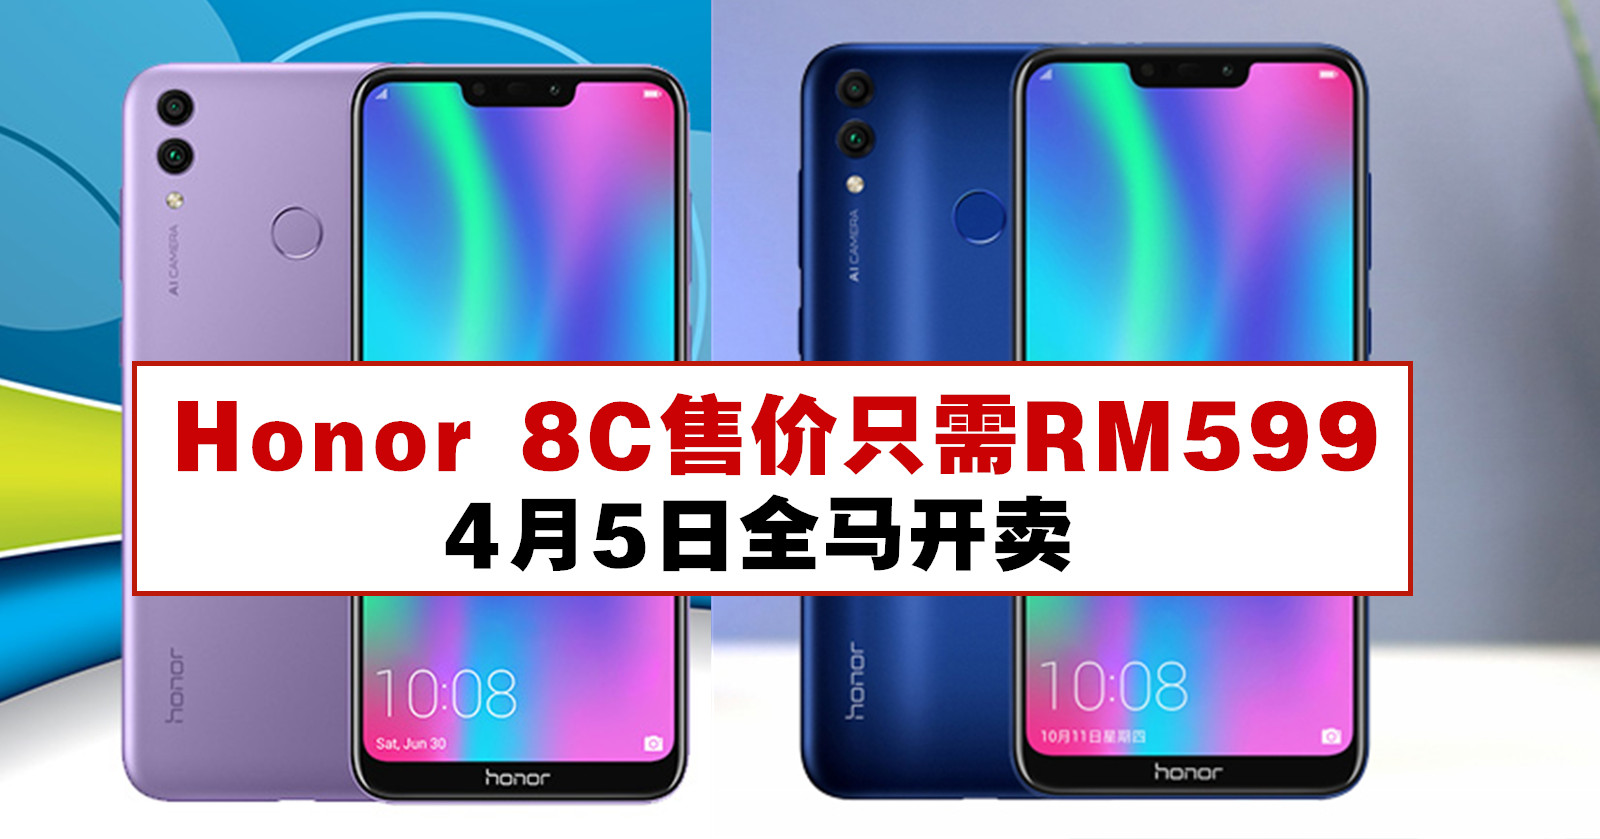 Honor 8C售价只需RM599